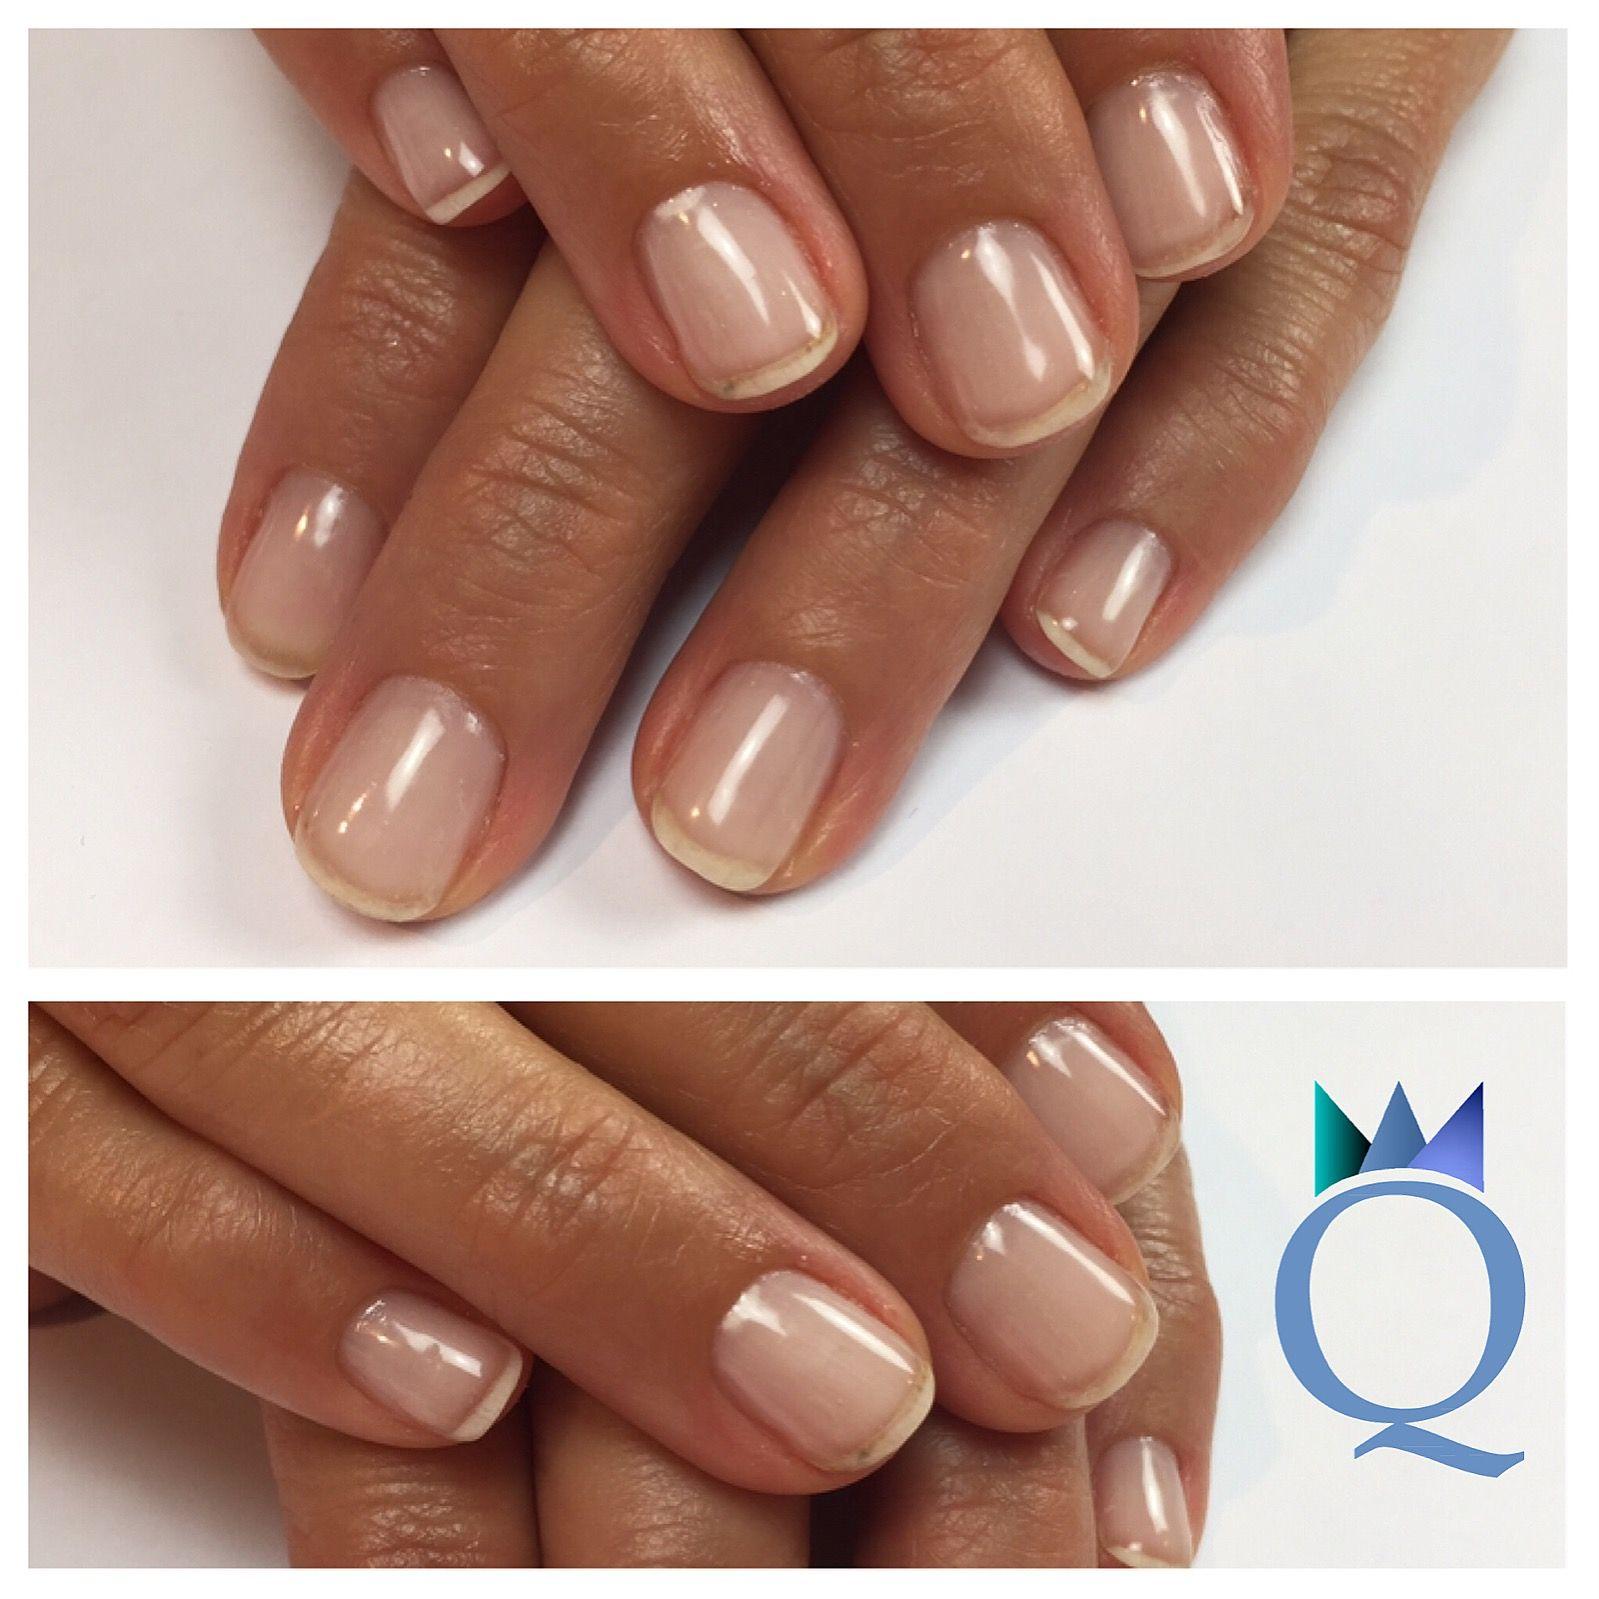 shortnails #gelnails #nails #simple #natural #kurzenägel #gelnägel ...